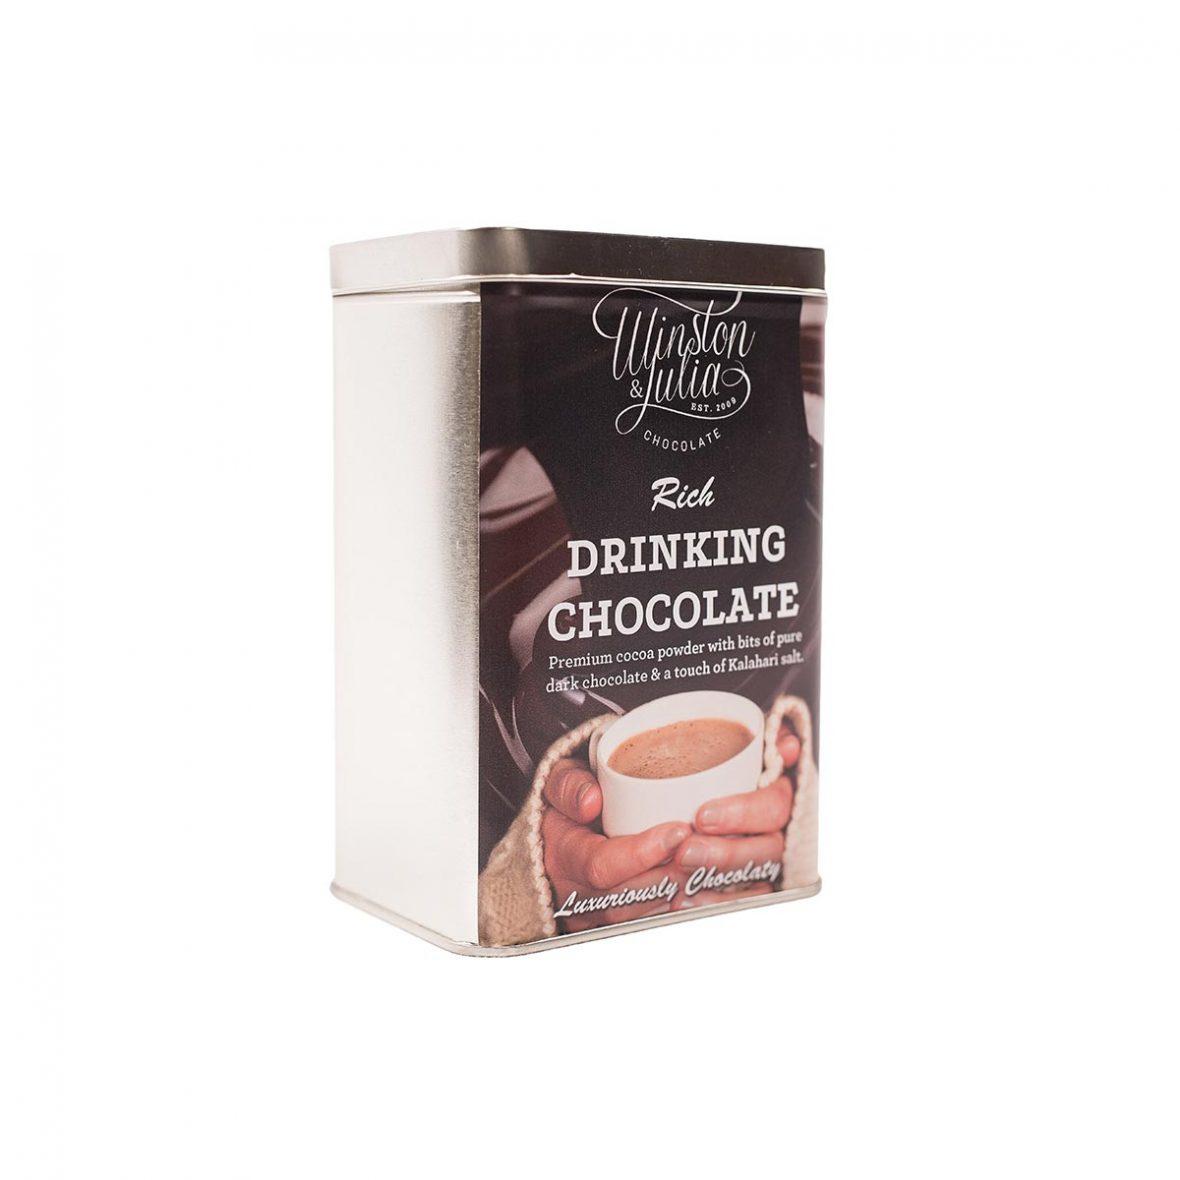 Drinking Chocolate - Tin